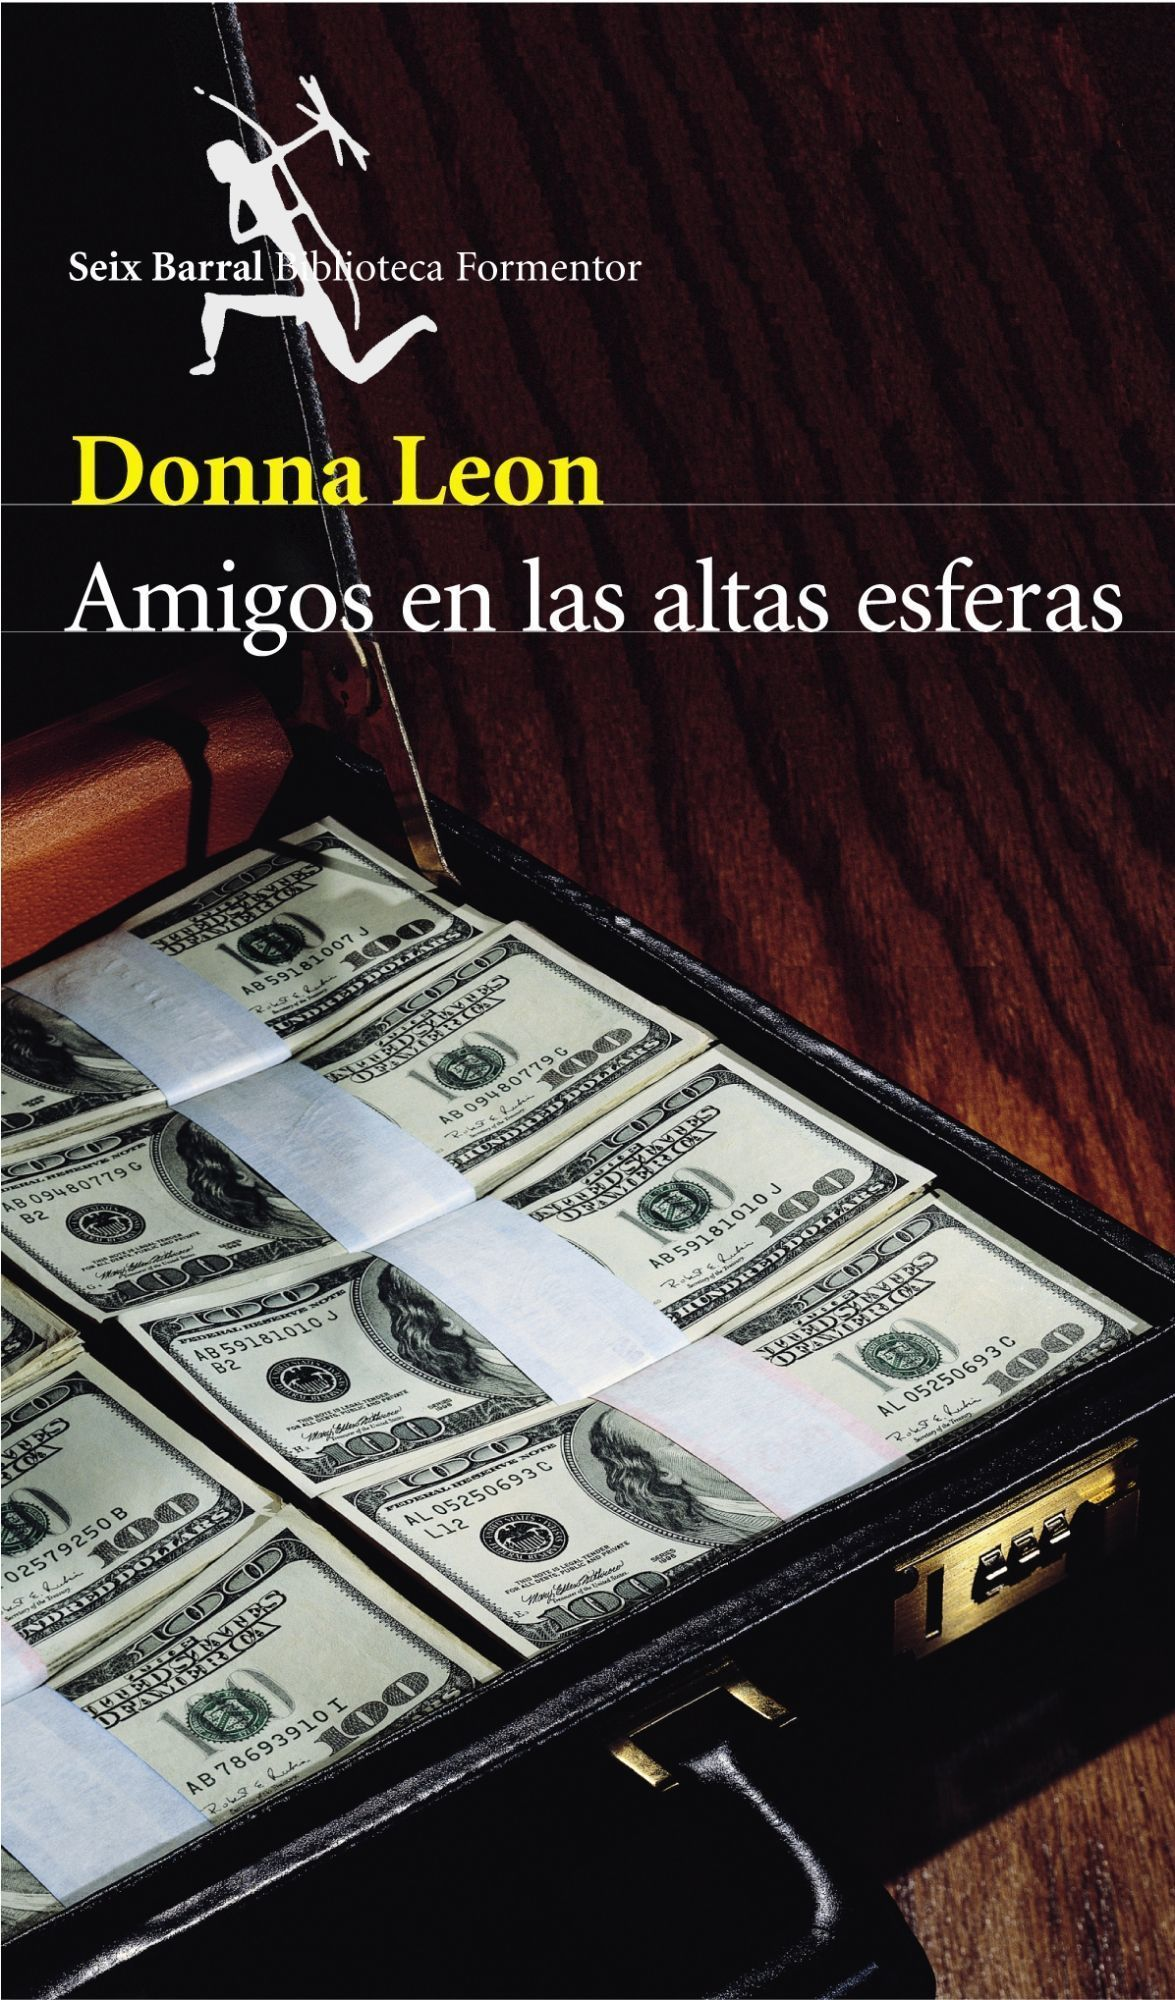 Guido Brunetti, el detective de las novelas de Donna Leon